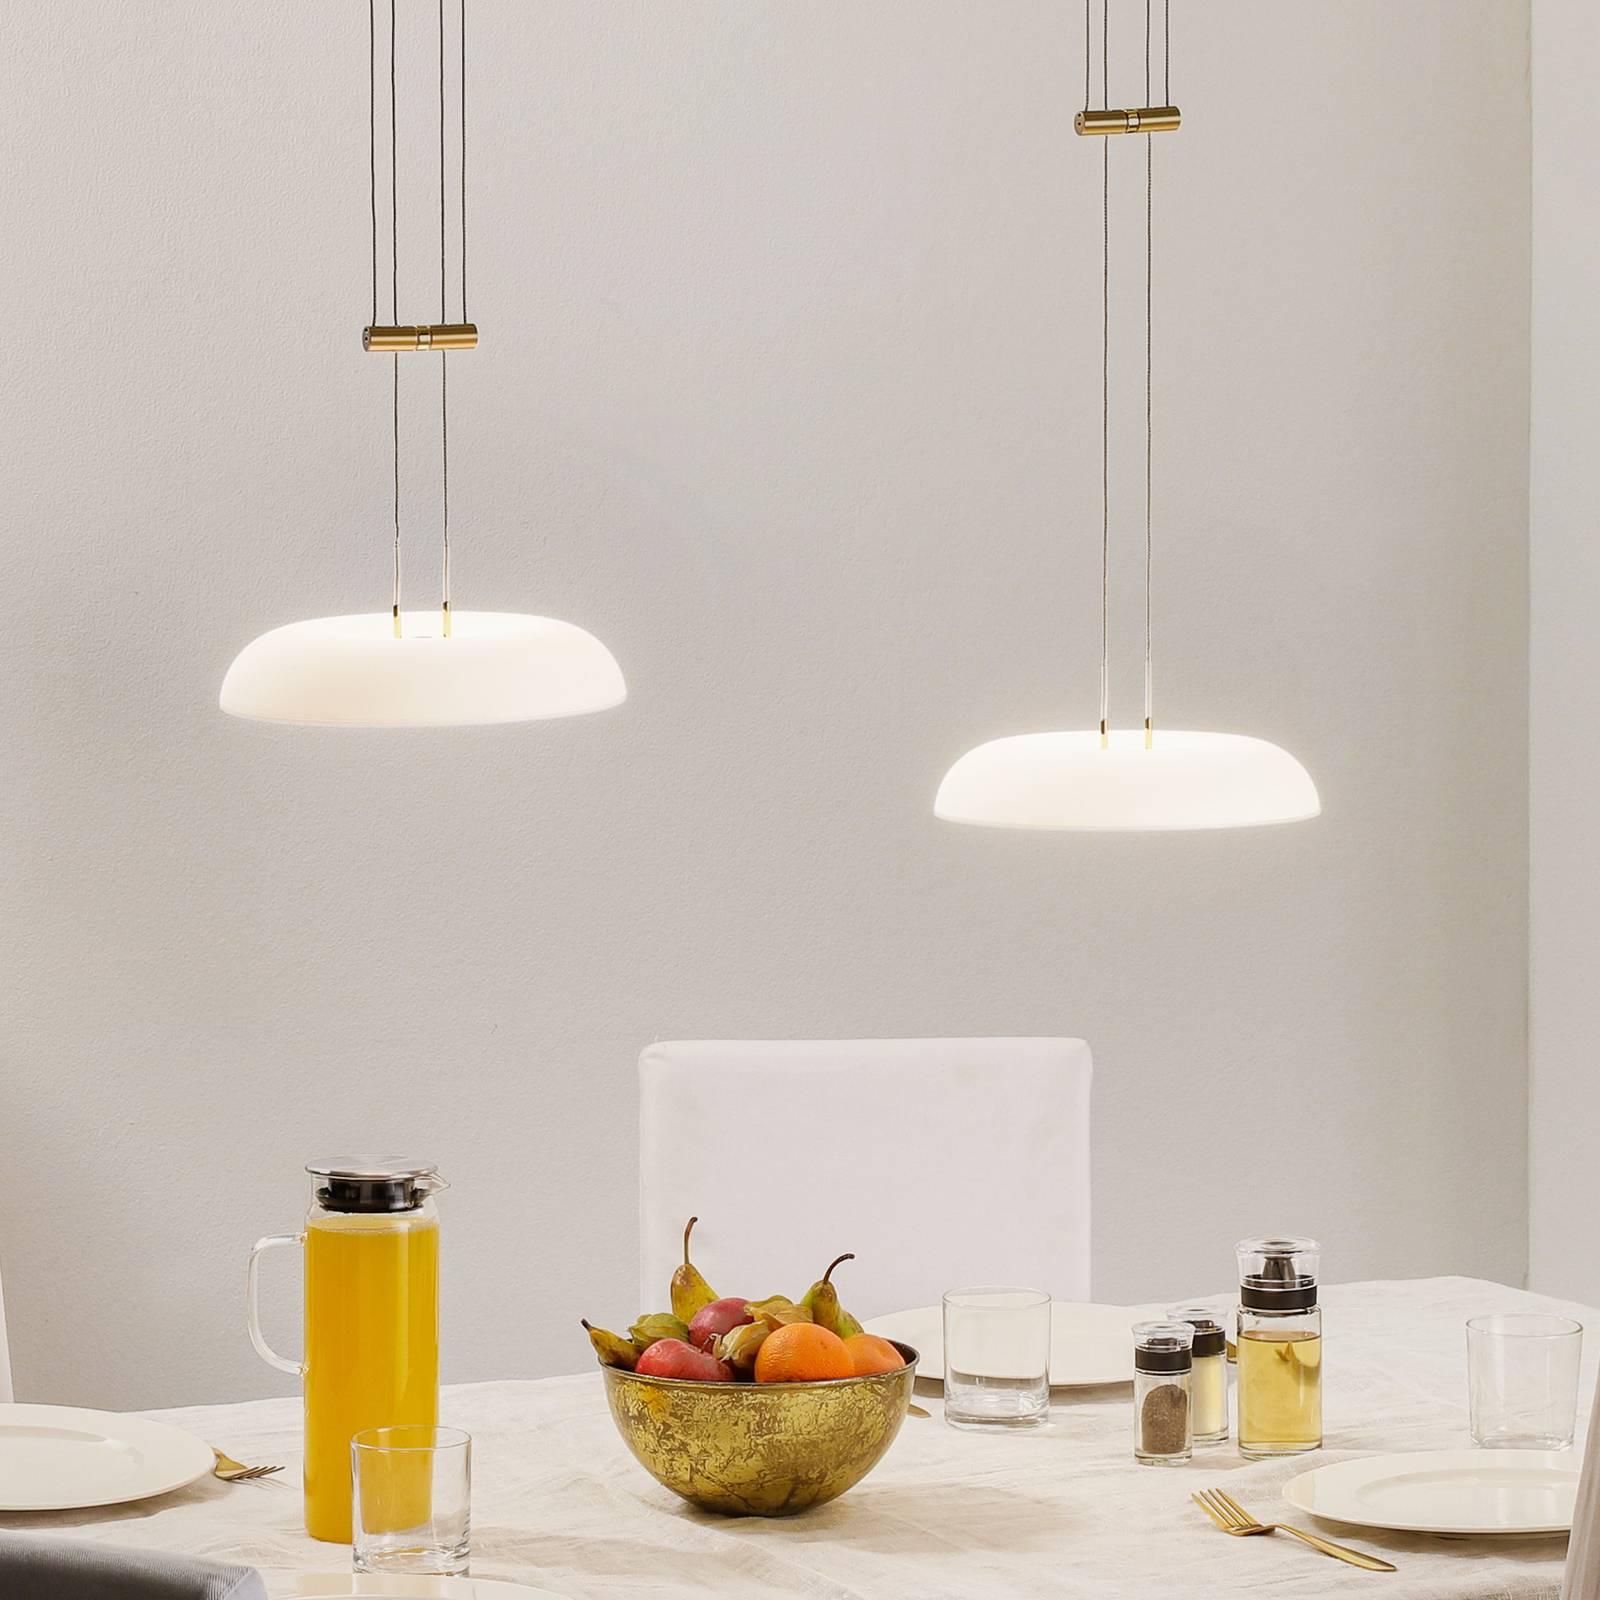 BANKAMP Vanity riippuvalaisin 2-lamp., messinki